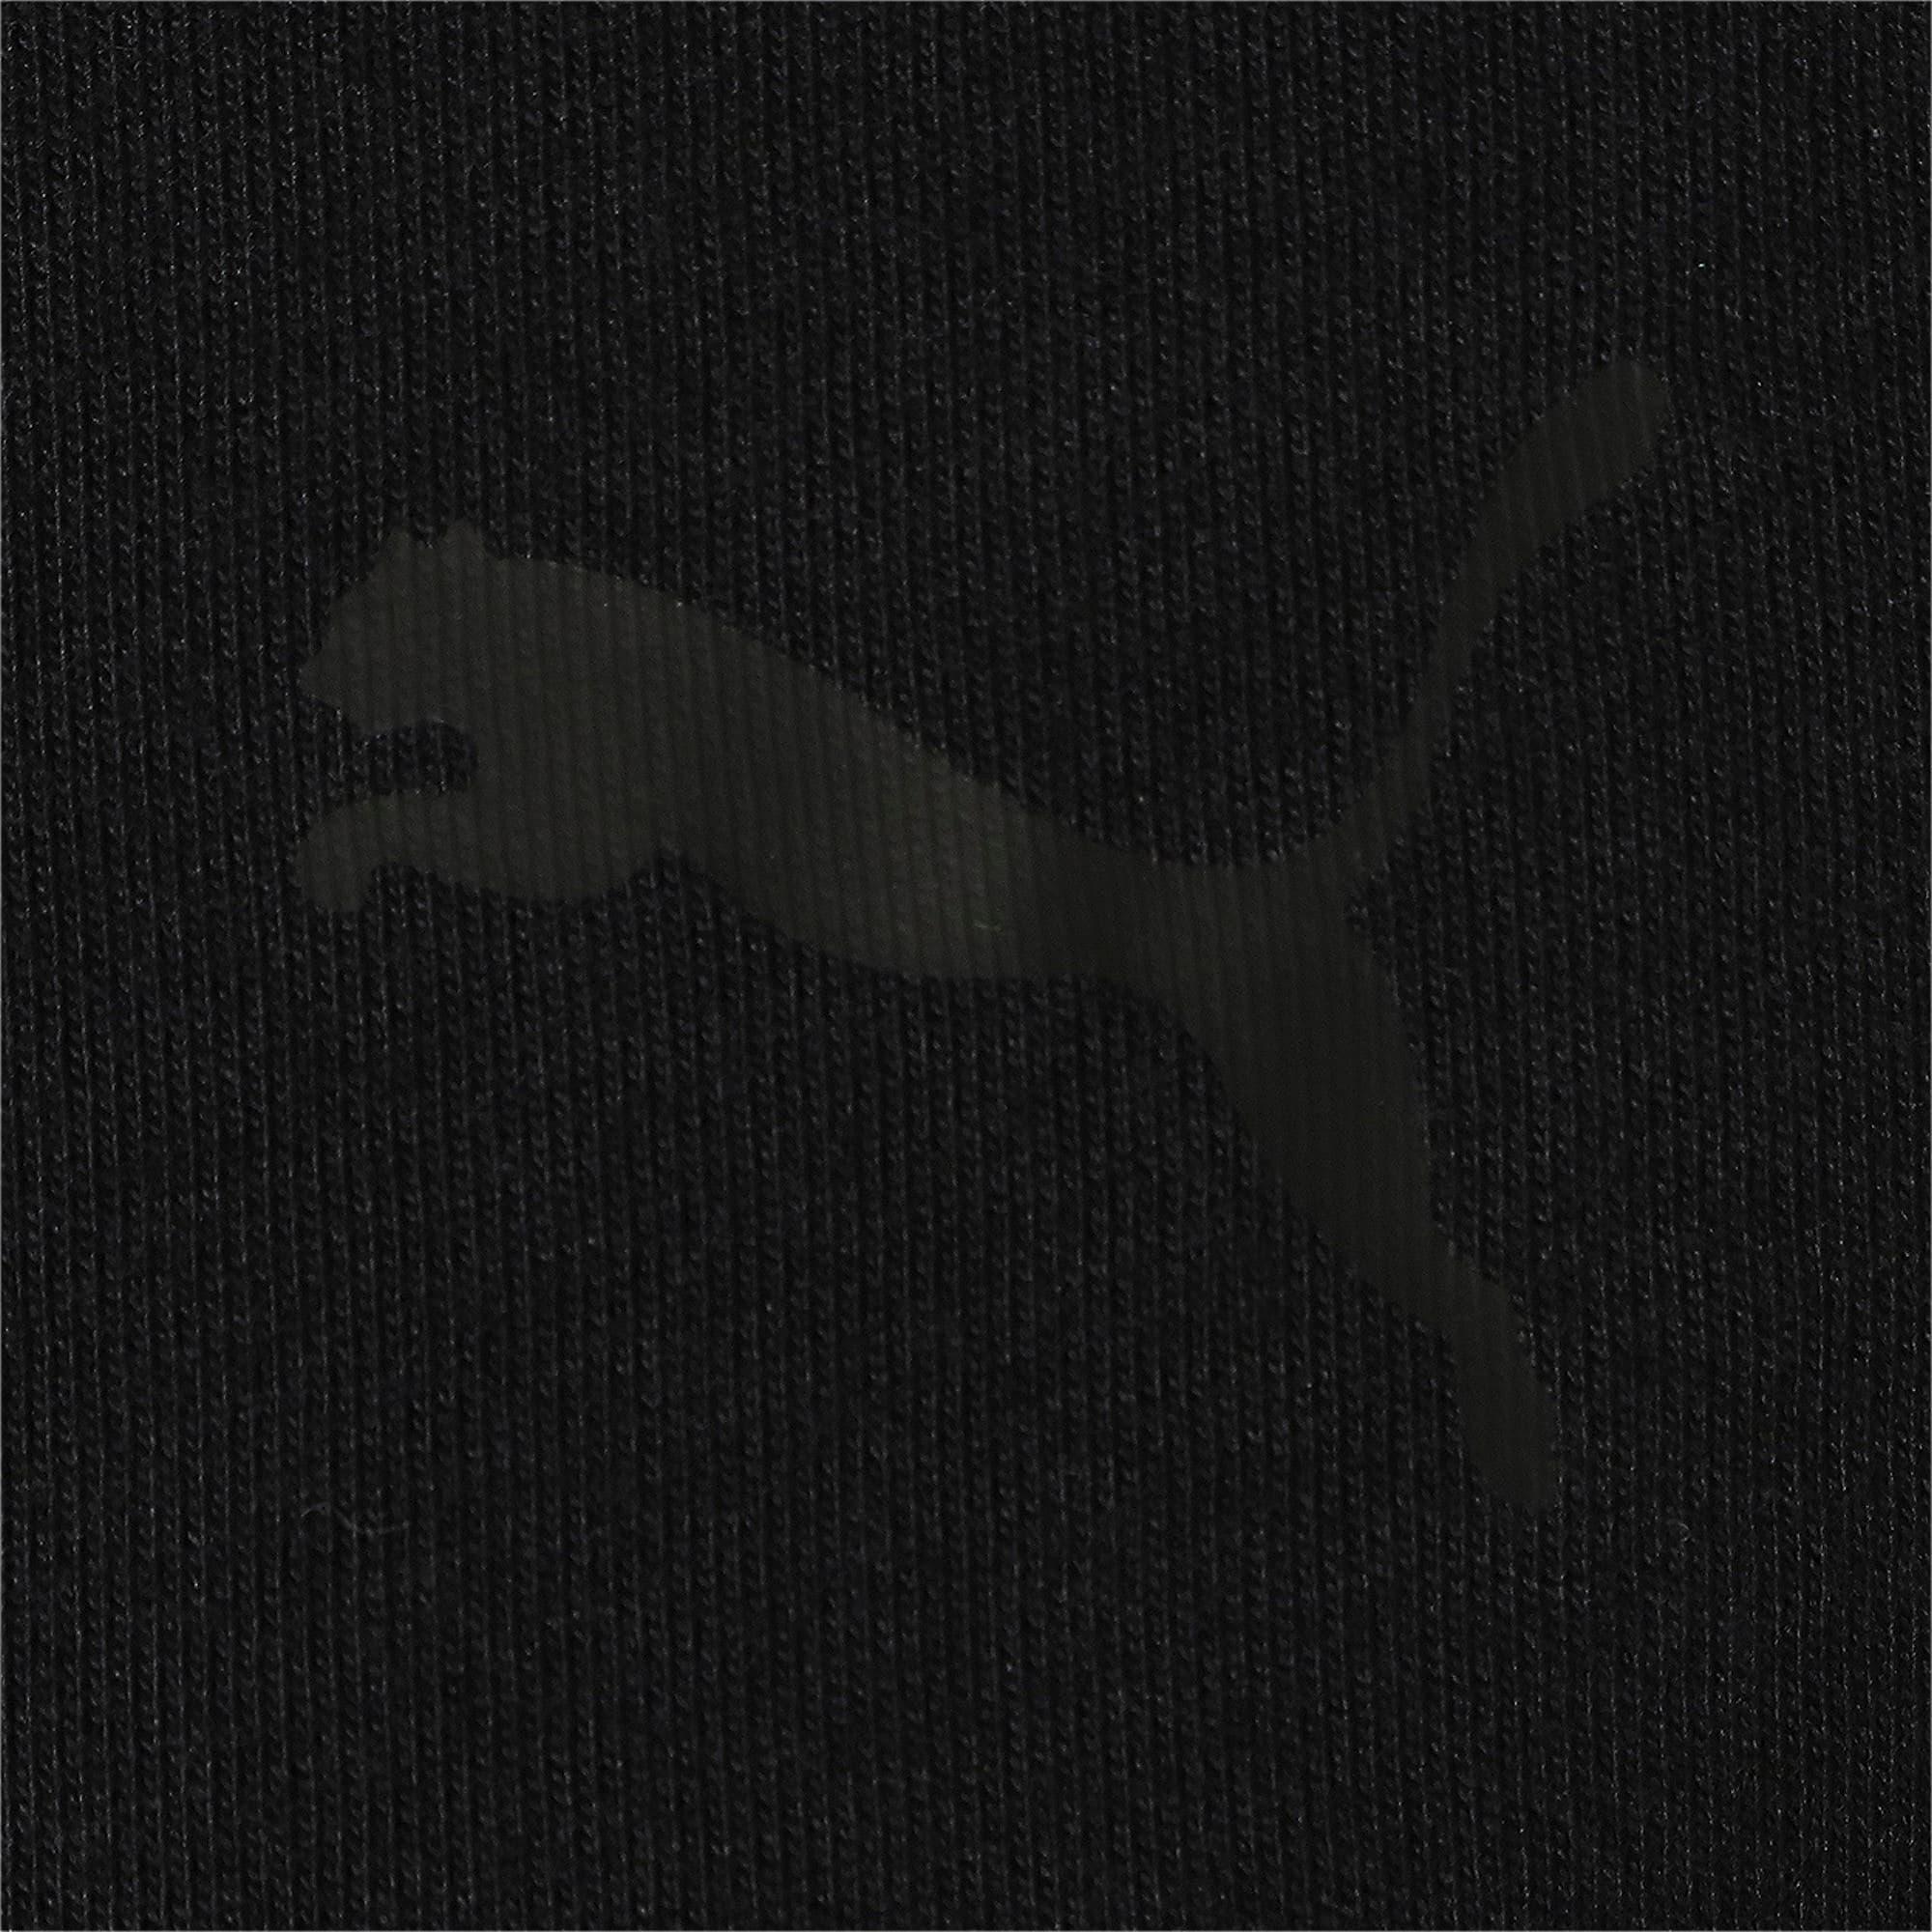 Thumbnail 4 of PUMA x SUE TSAI ウィメンズ Tシャツ, Puma Black, medium-JPN